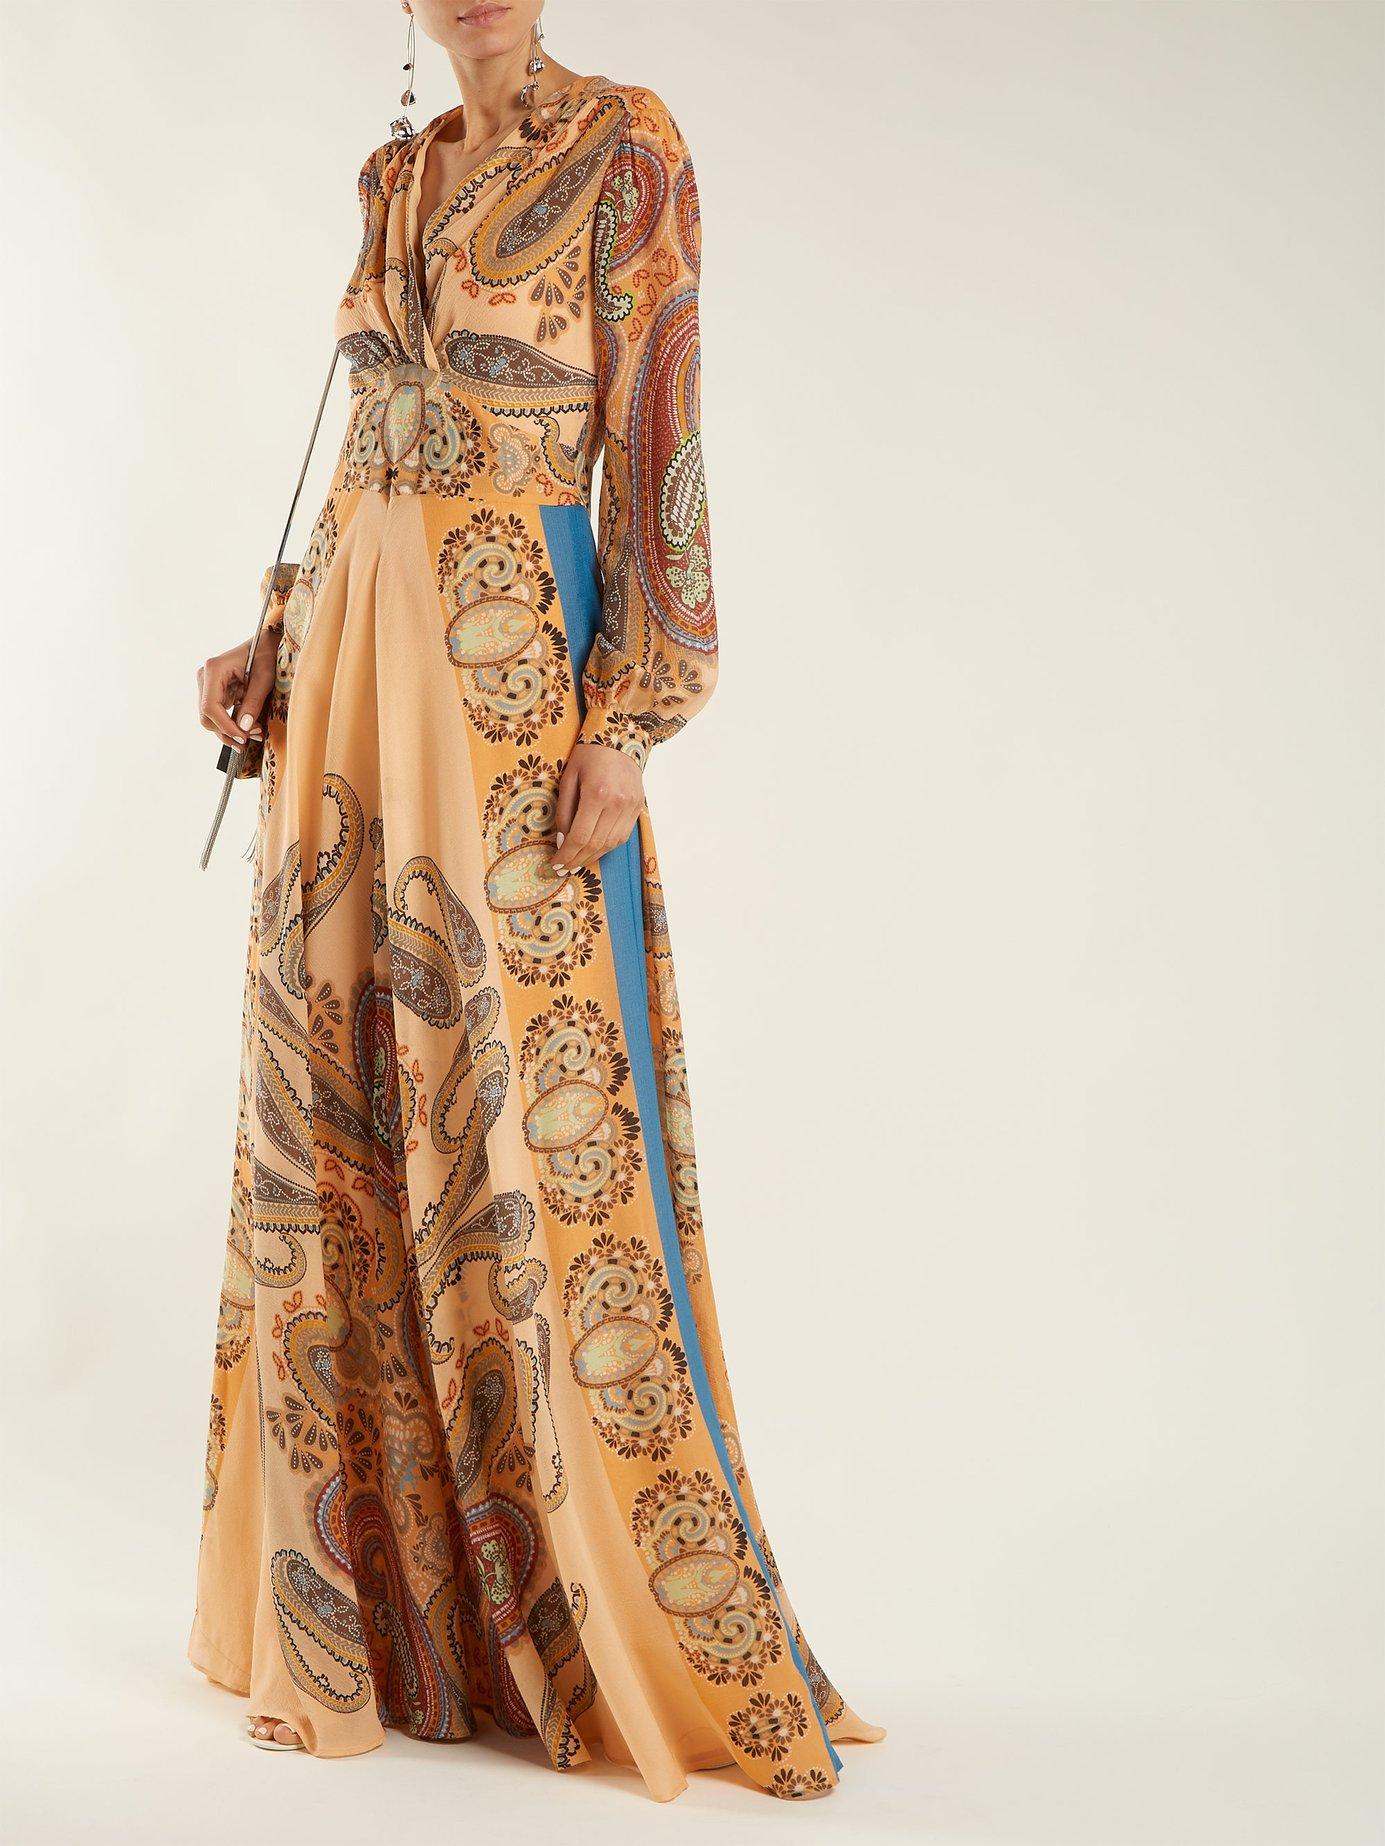 Jasper paisley silk dress by Etro